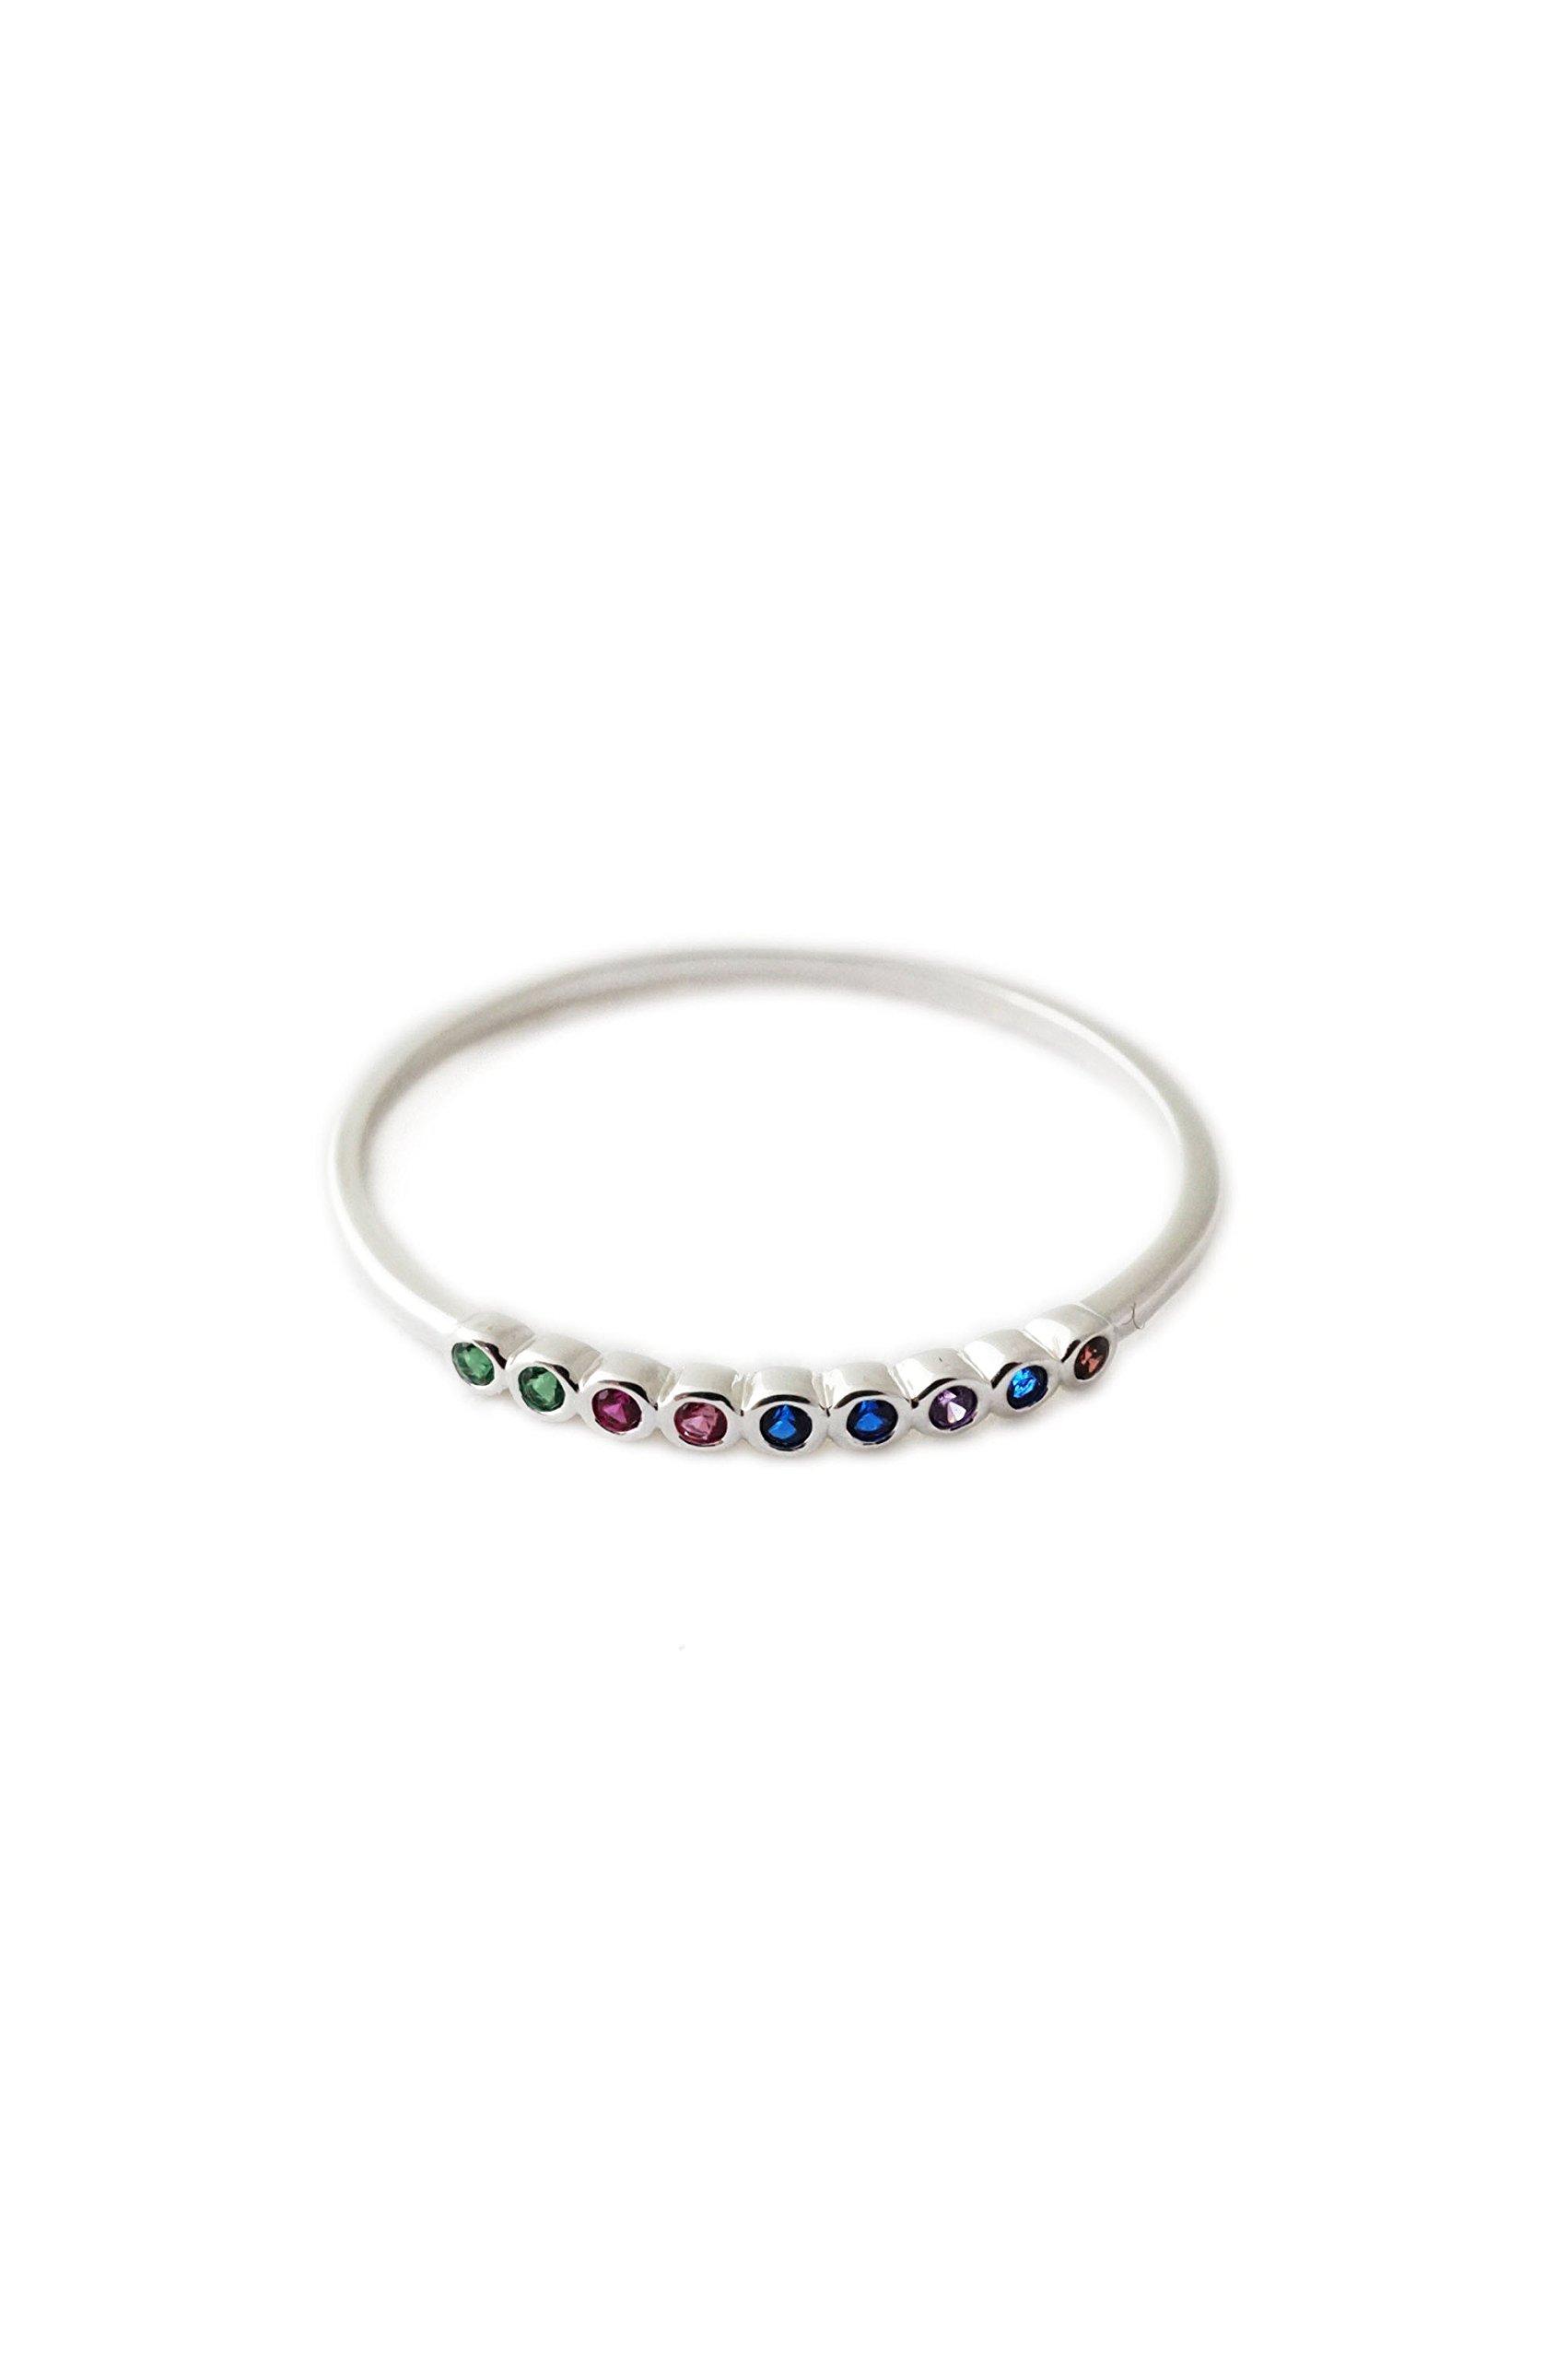 HONEYCAT Rainbow Tiny Crystal Bezel Ringin Sterling Silver Plate | Minimalist, Delicate Jewelry